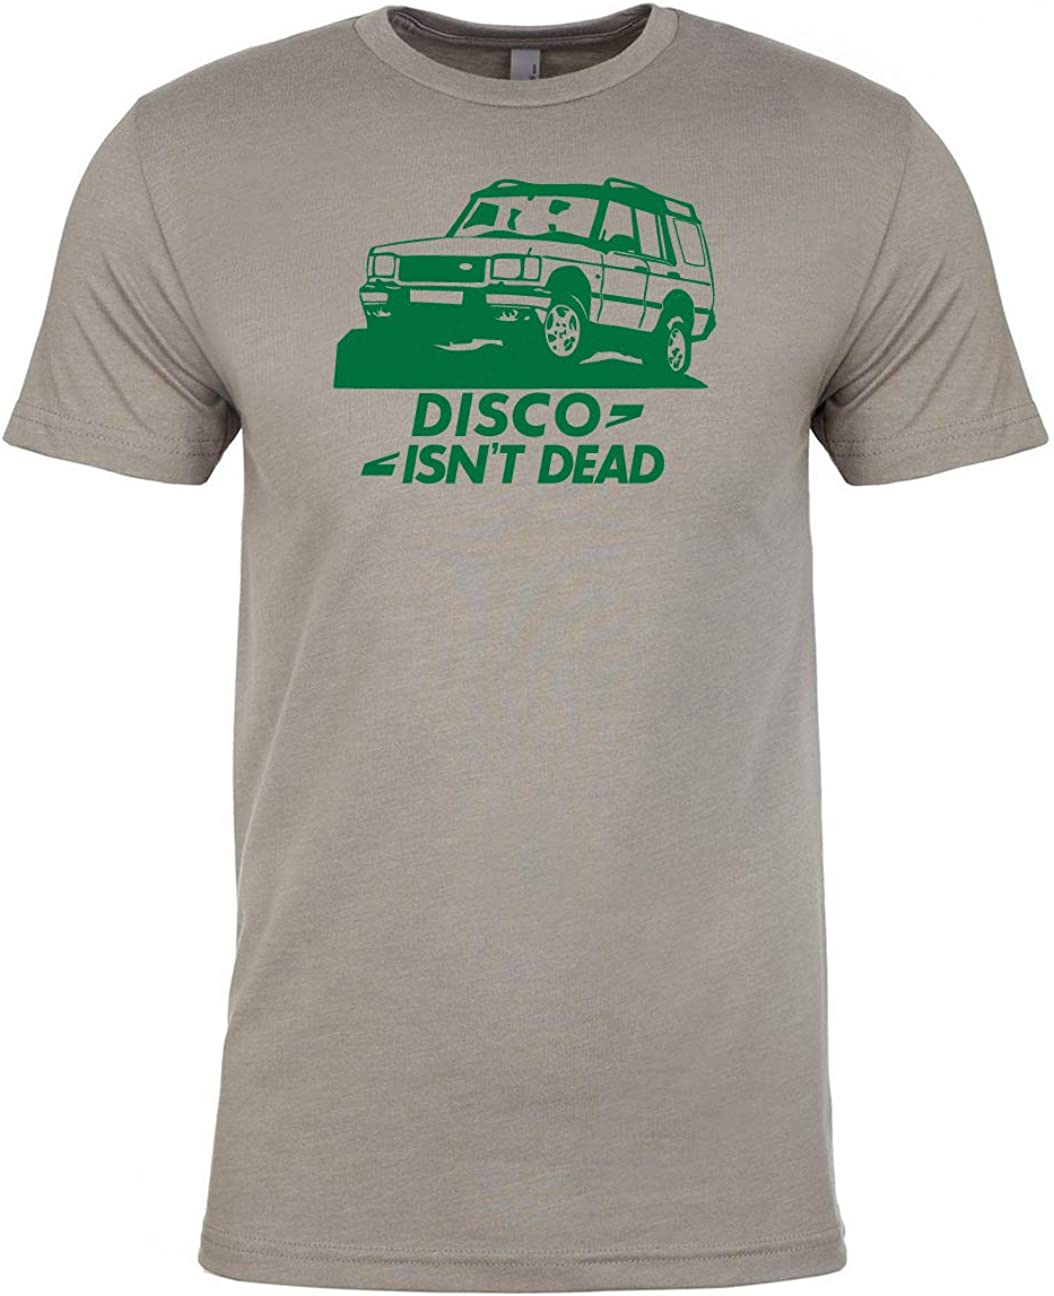 Luso Disco Isnt Dead 4x4 T-Shirt /& Sticker Disco 4x4 Offroad